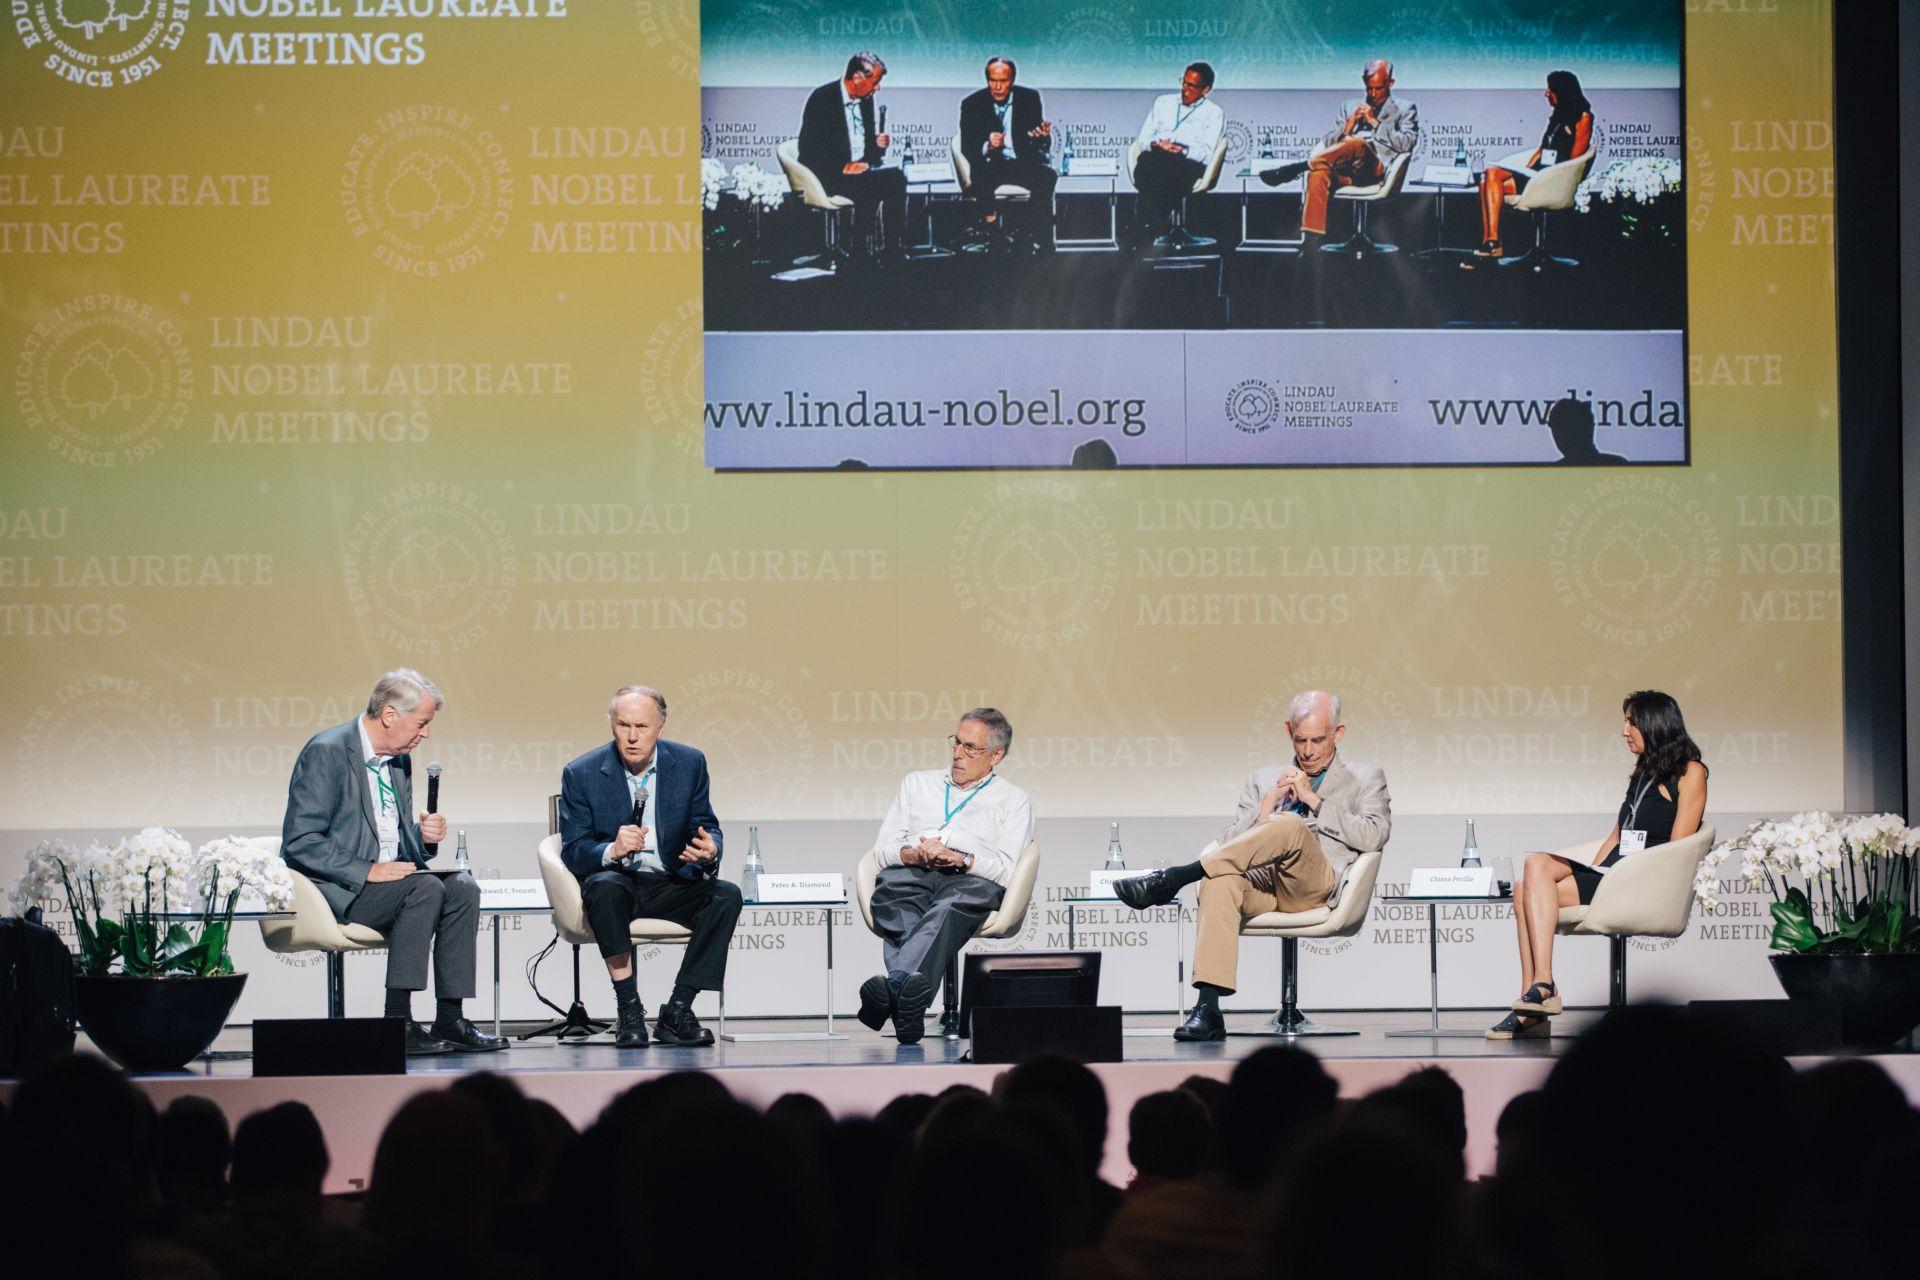 Panel discussion during the 6th Lindau Meeting on Economic Sciences. Picture/Credit: Julia Nimke/Lindau Nobel Laureate Meetings